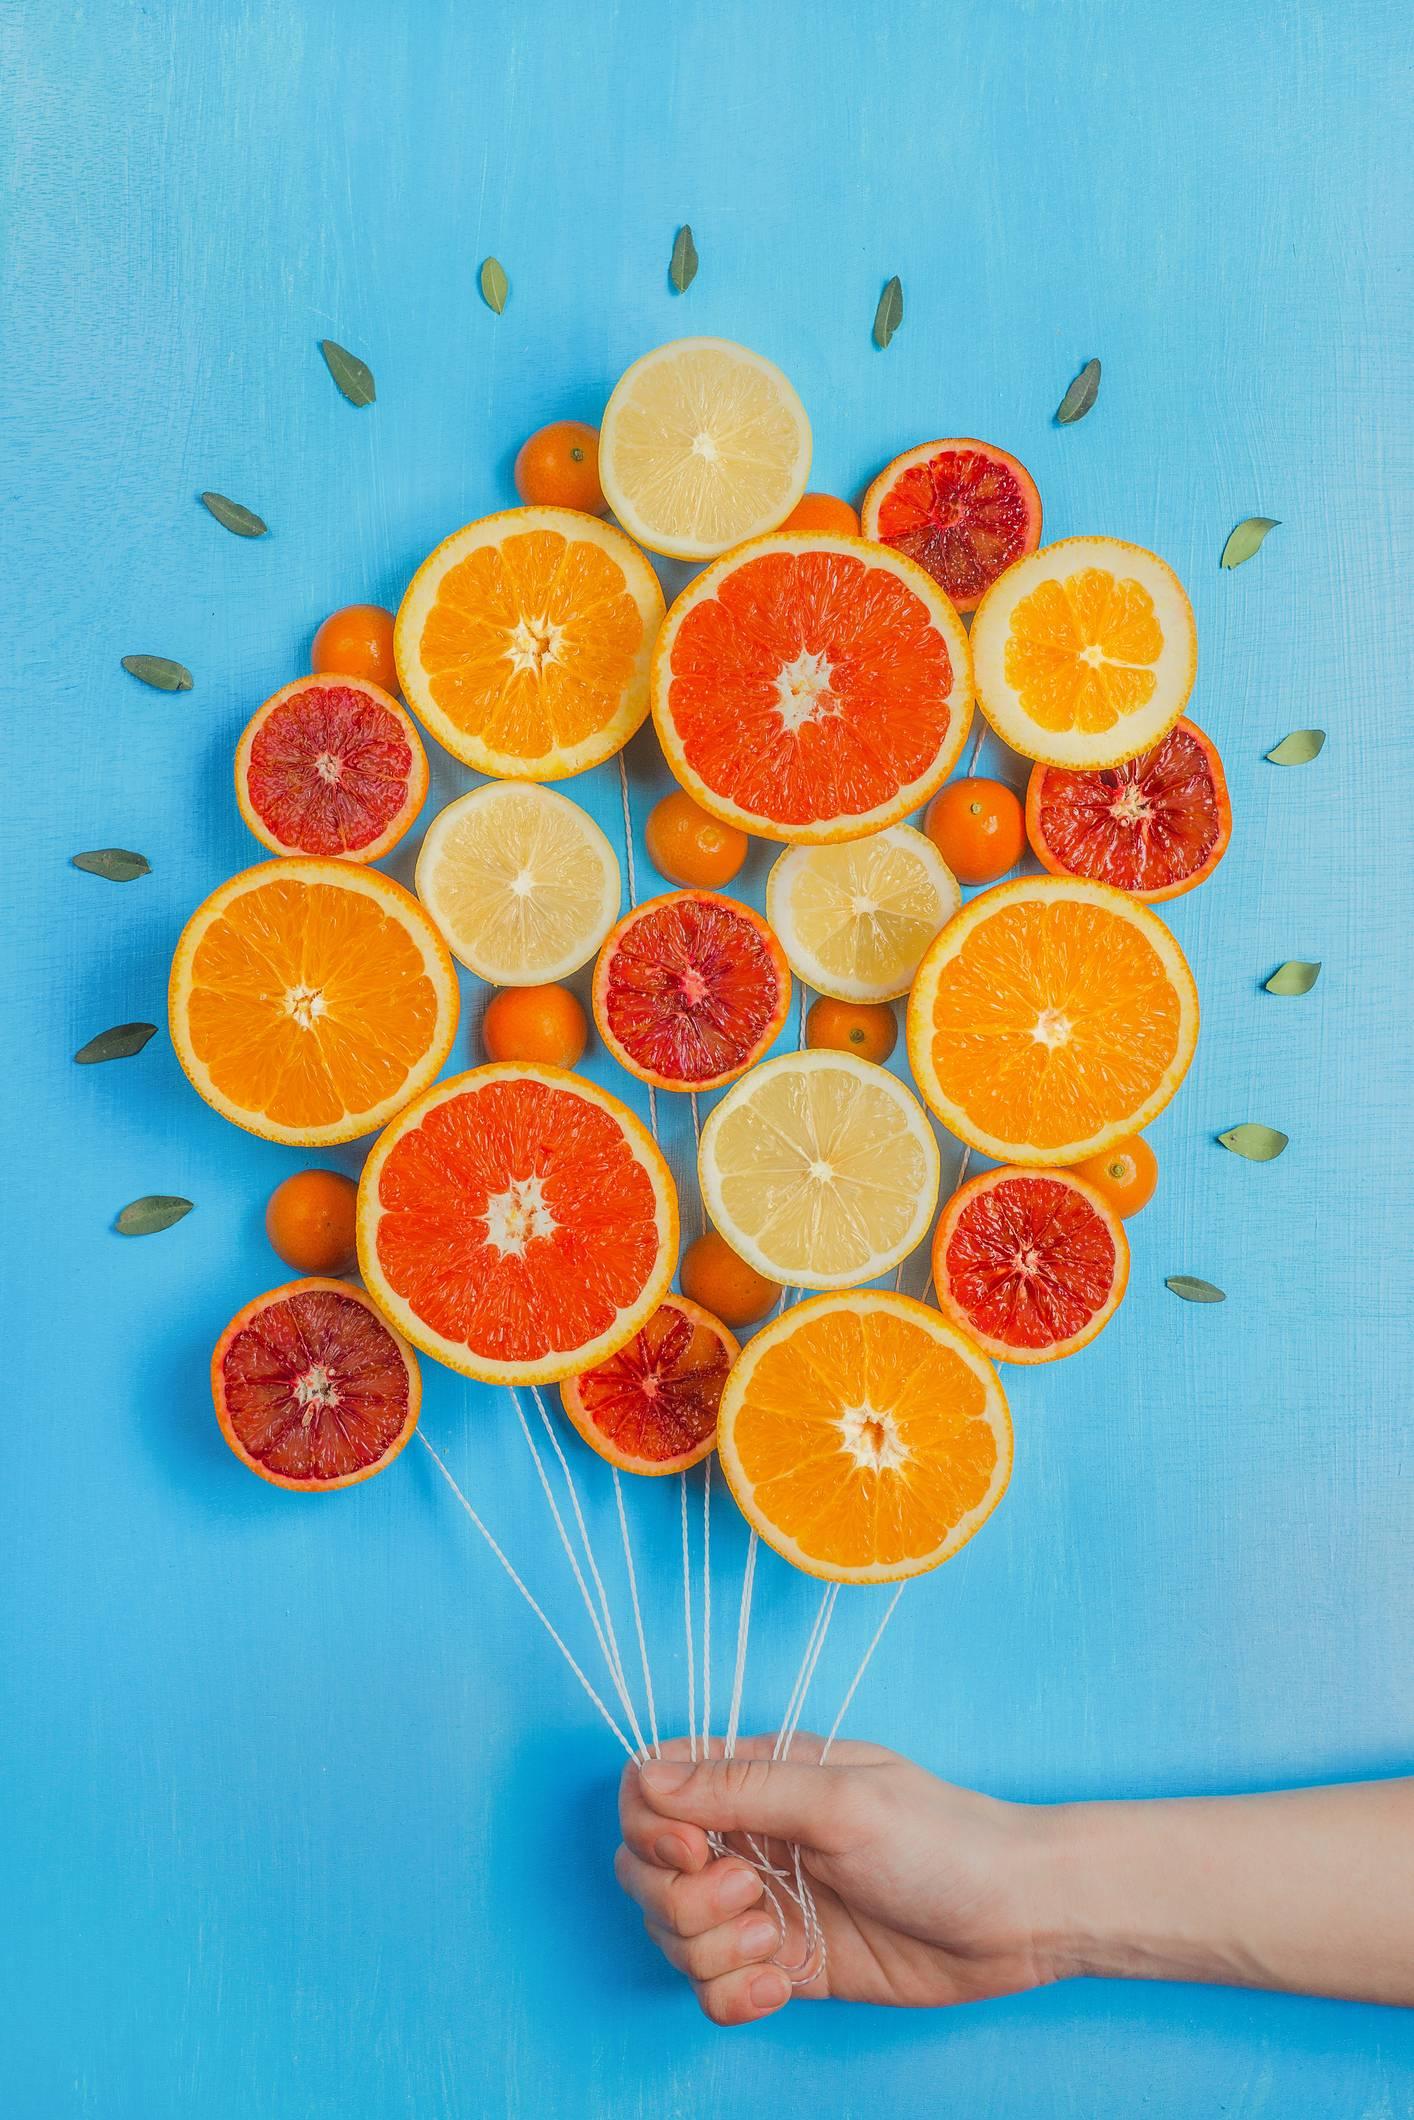 Сонник апельсин дают вам. к чему снится апельсин дают вам видеть во сне - сонник дома солнца